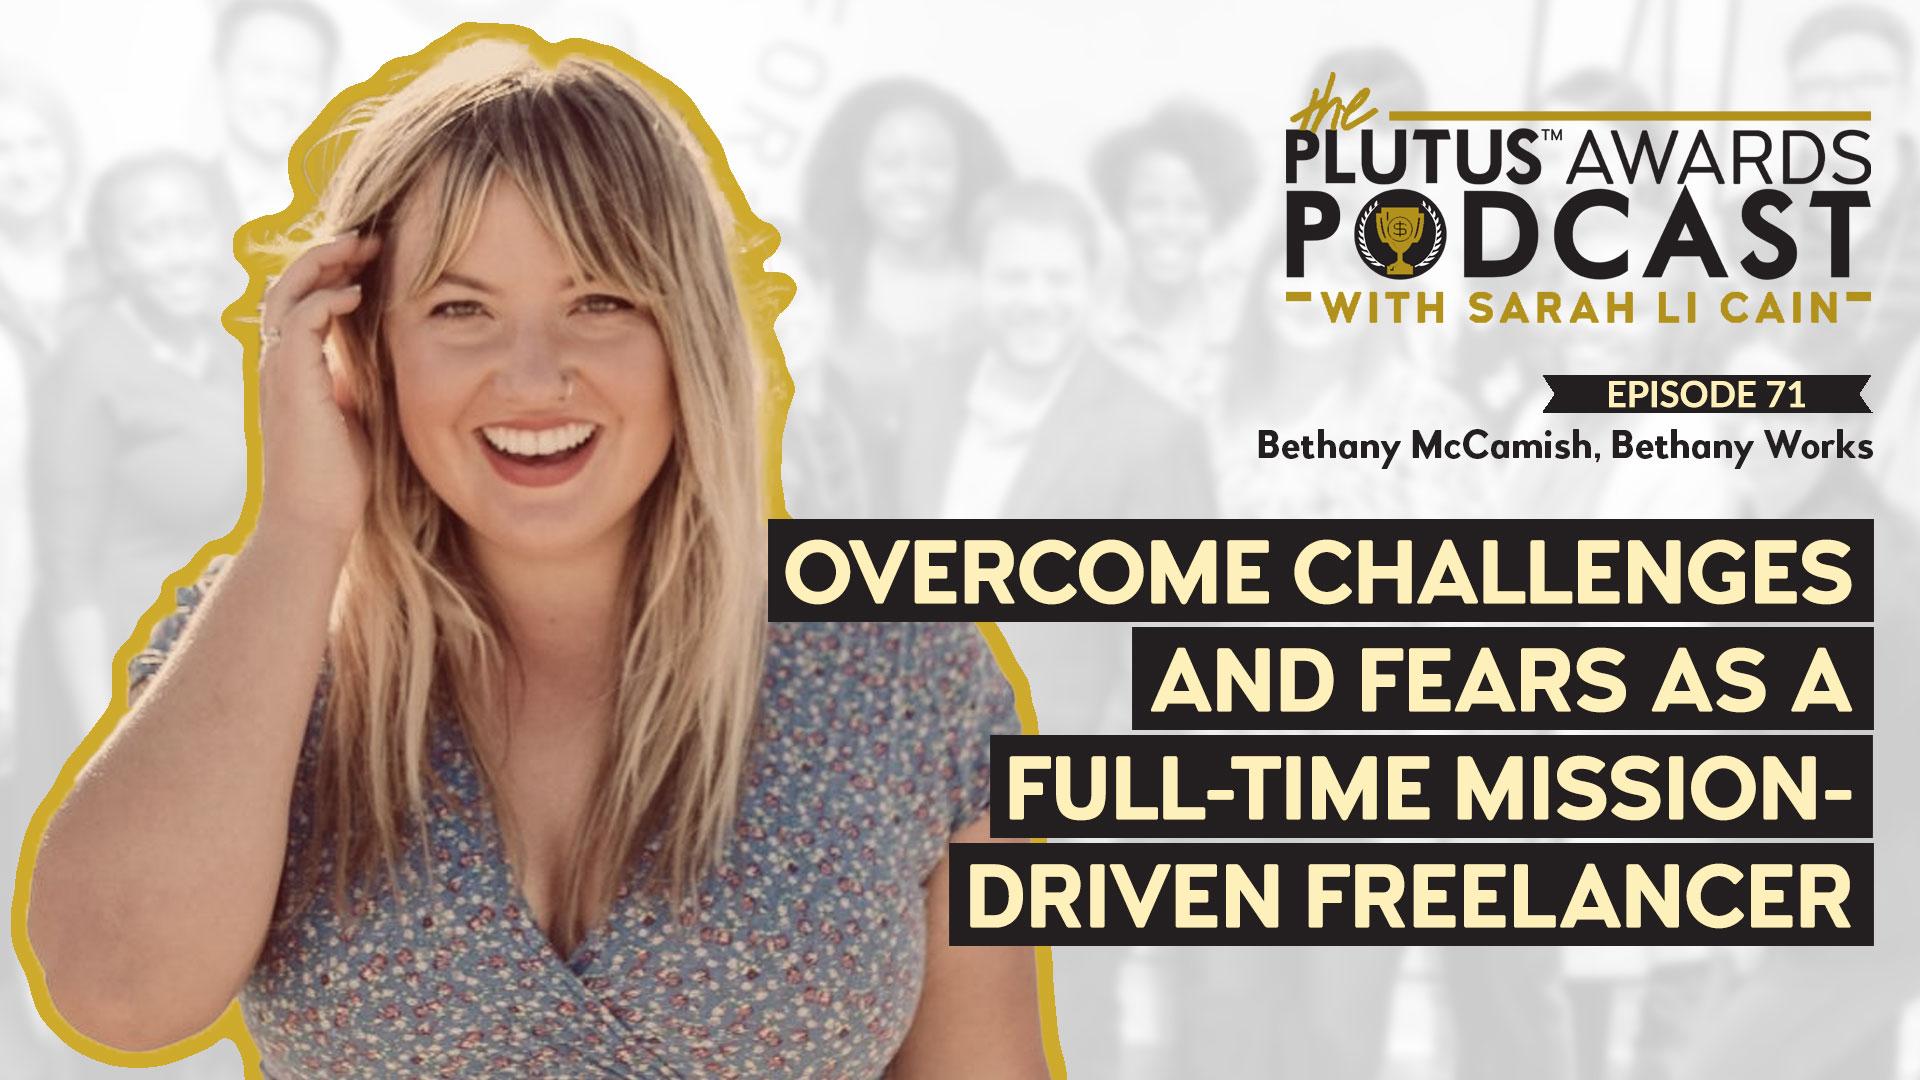 Plutus Awards Podcast - Bethany McCamish Featured Image